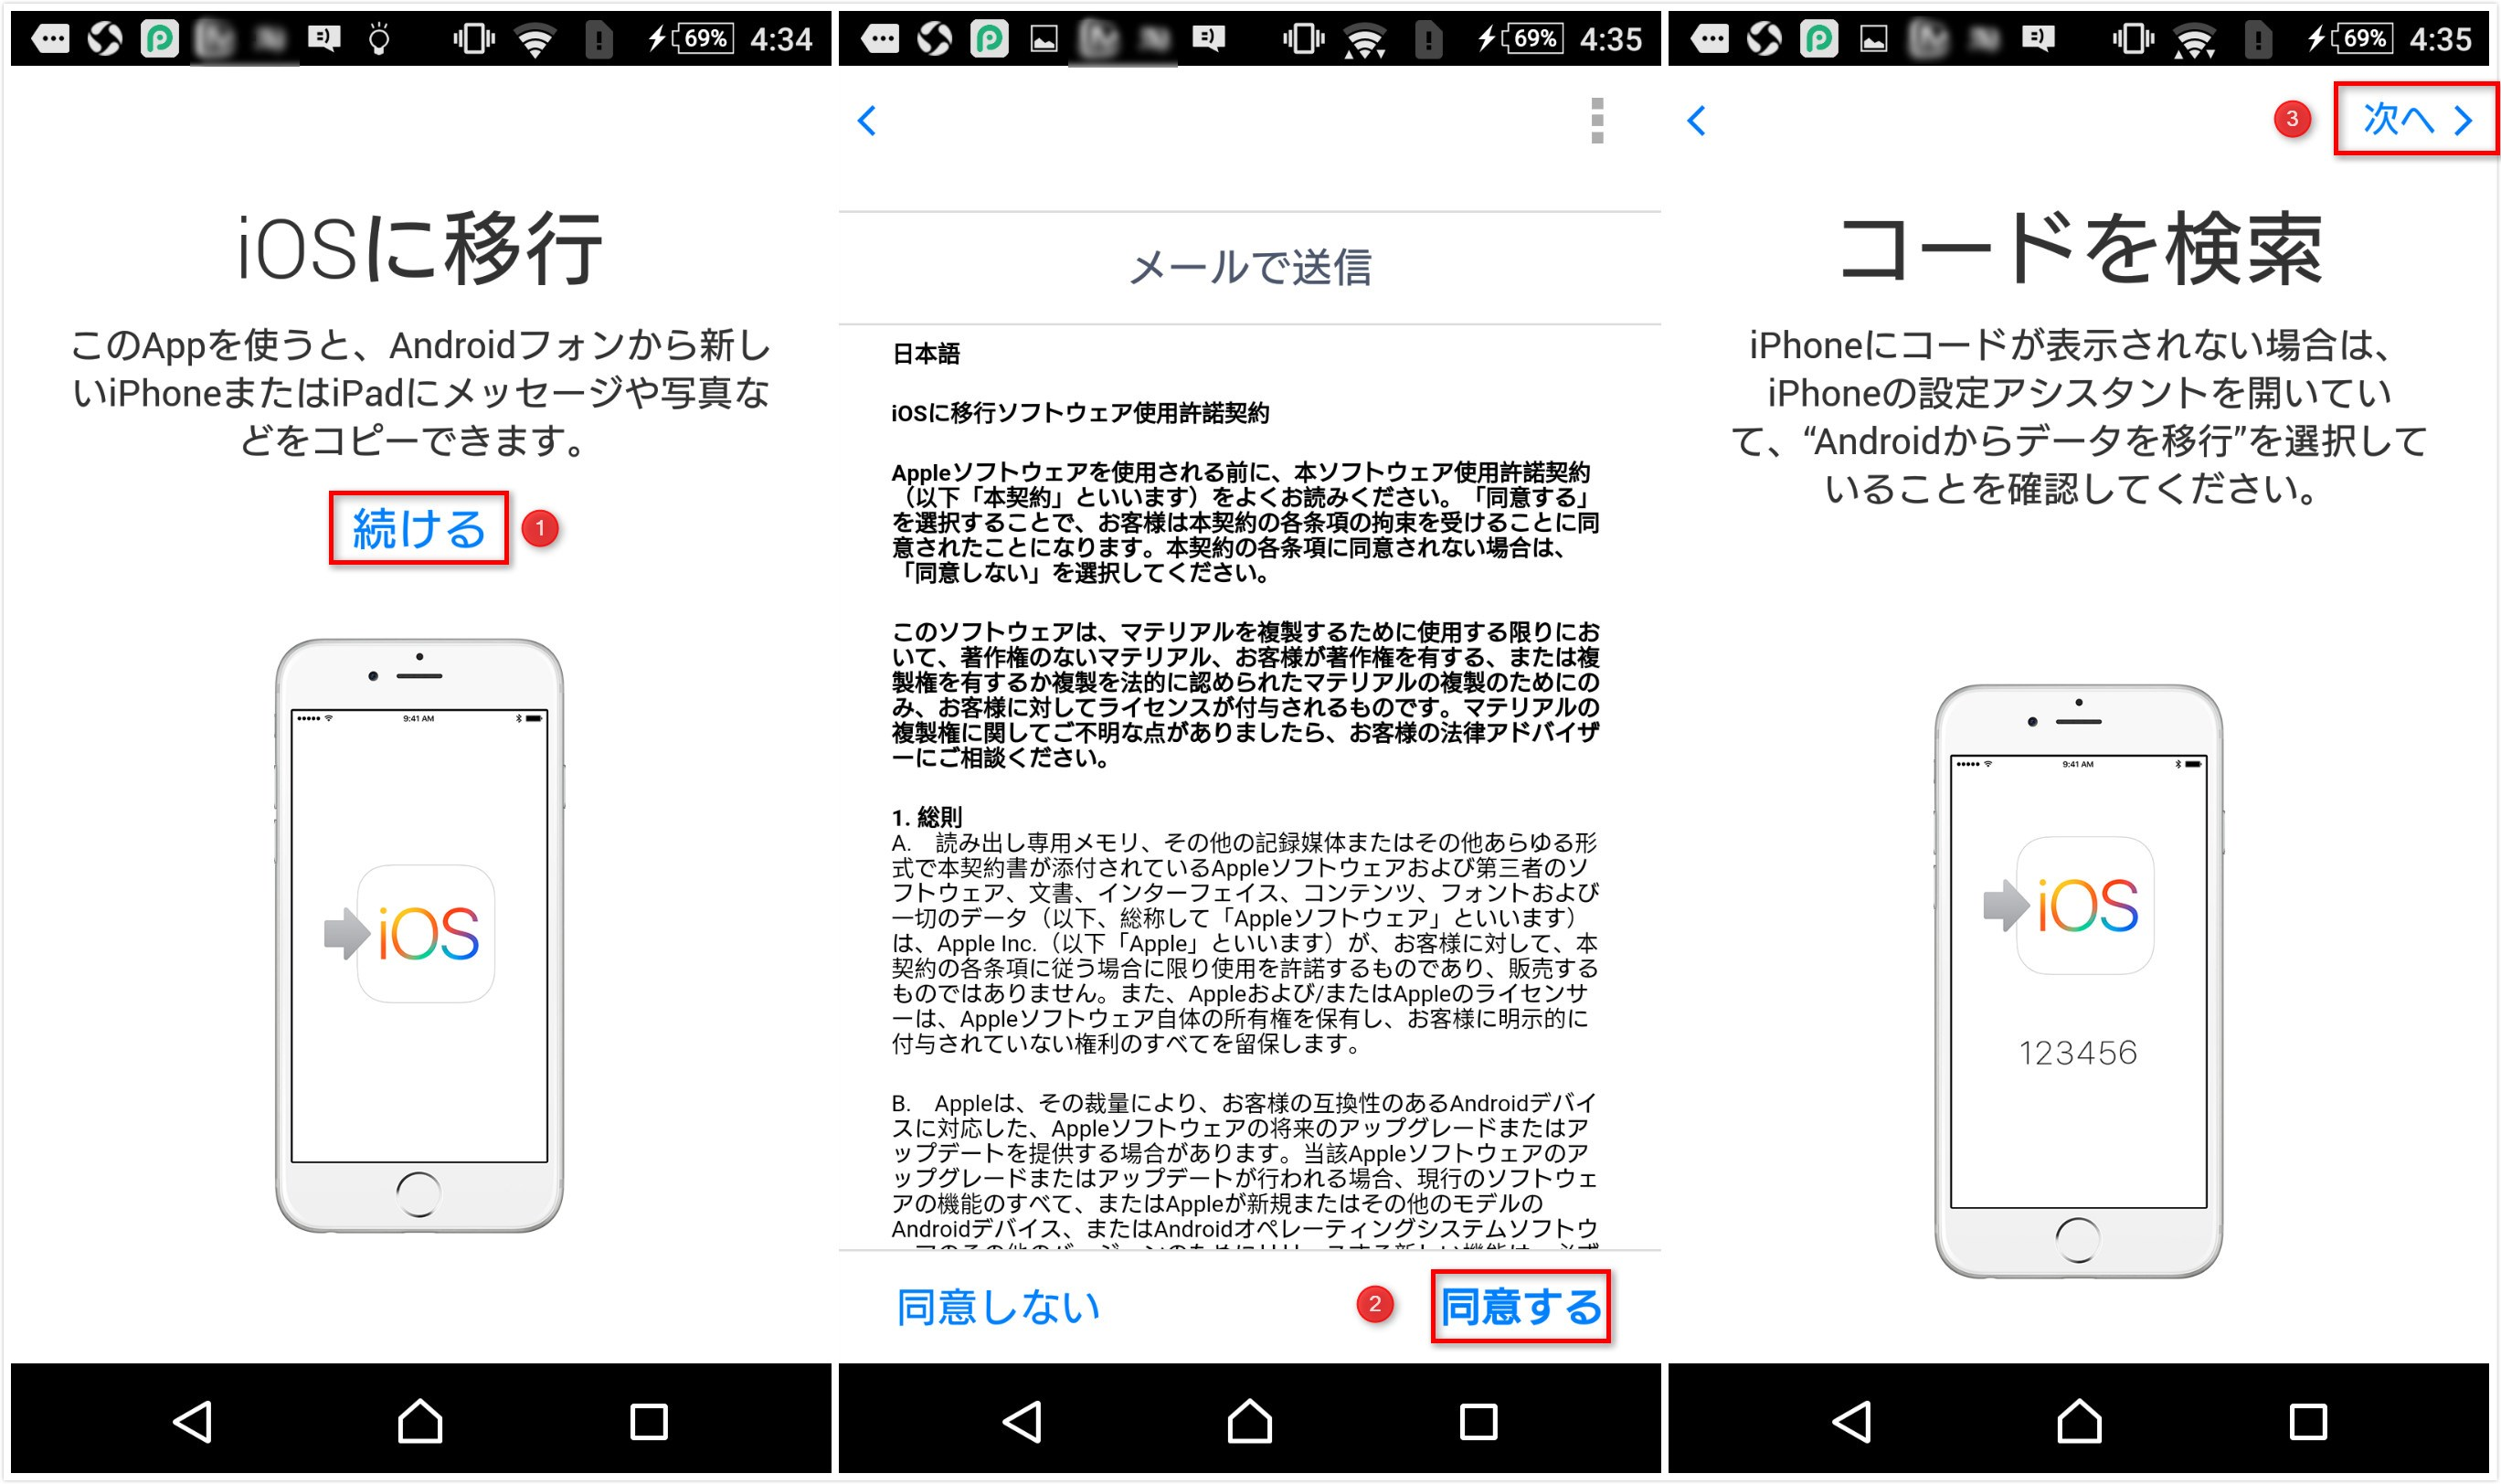 「Move to iOS」でAndroidからiPhone XS/XS Max/XR/X/8/7/6sにデータを移行する